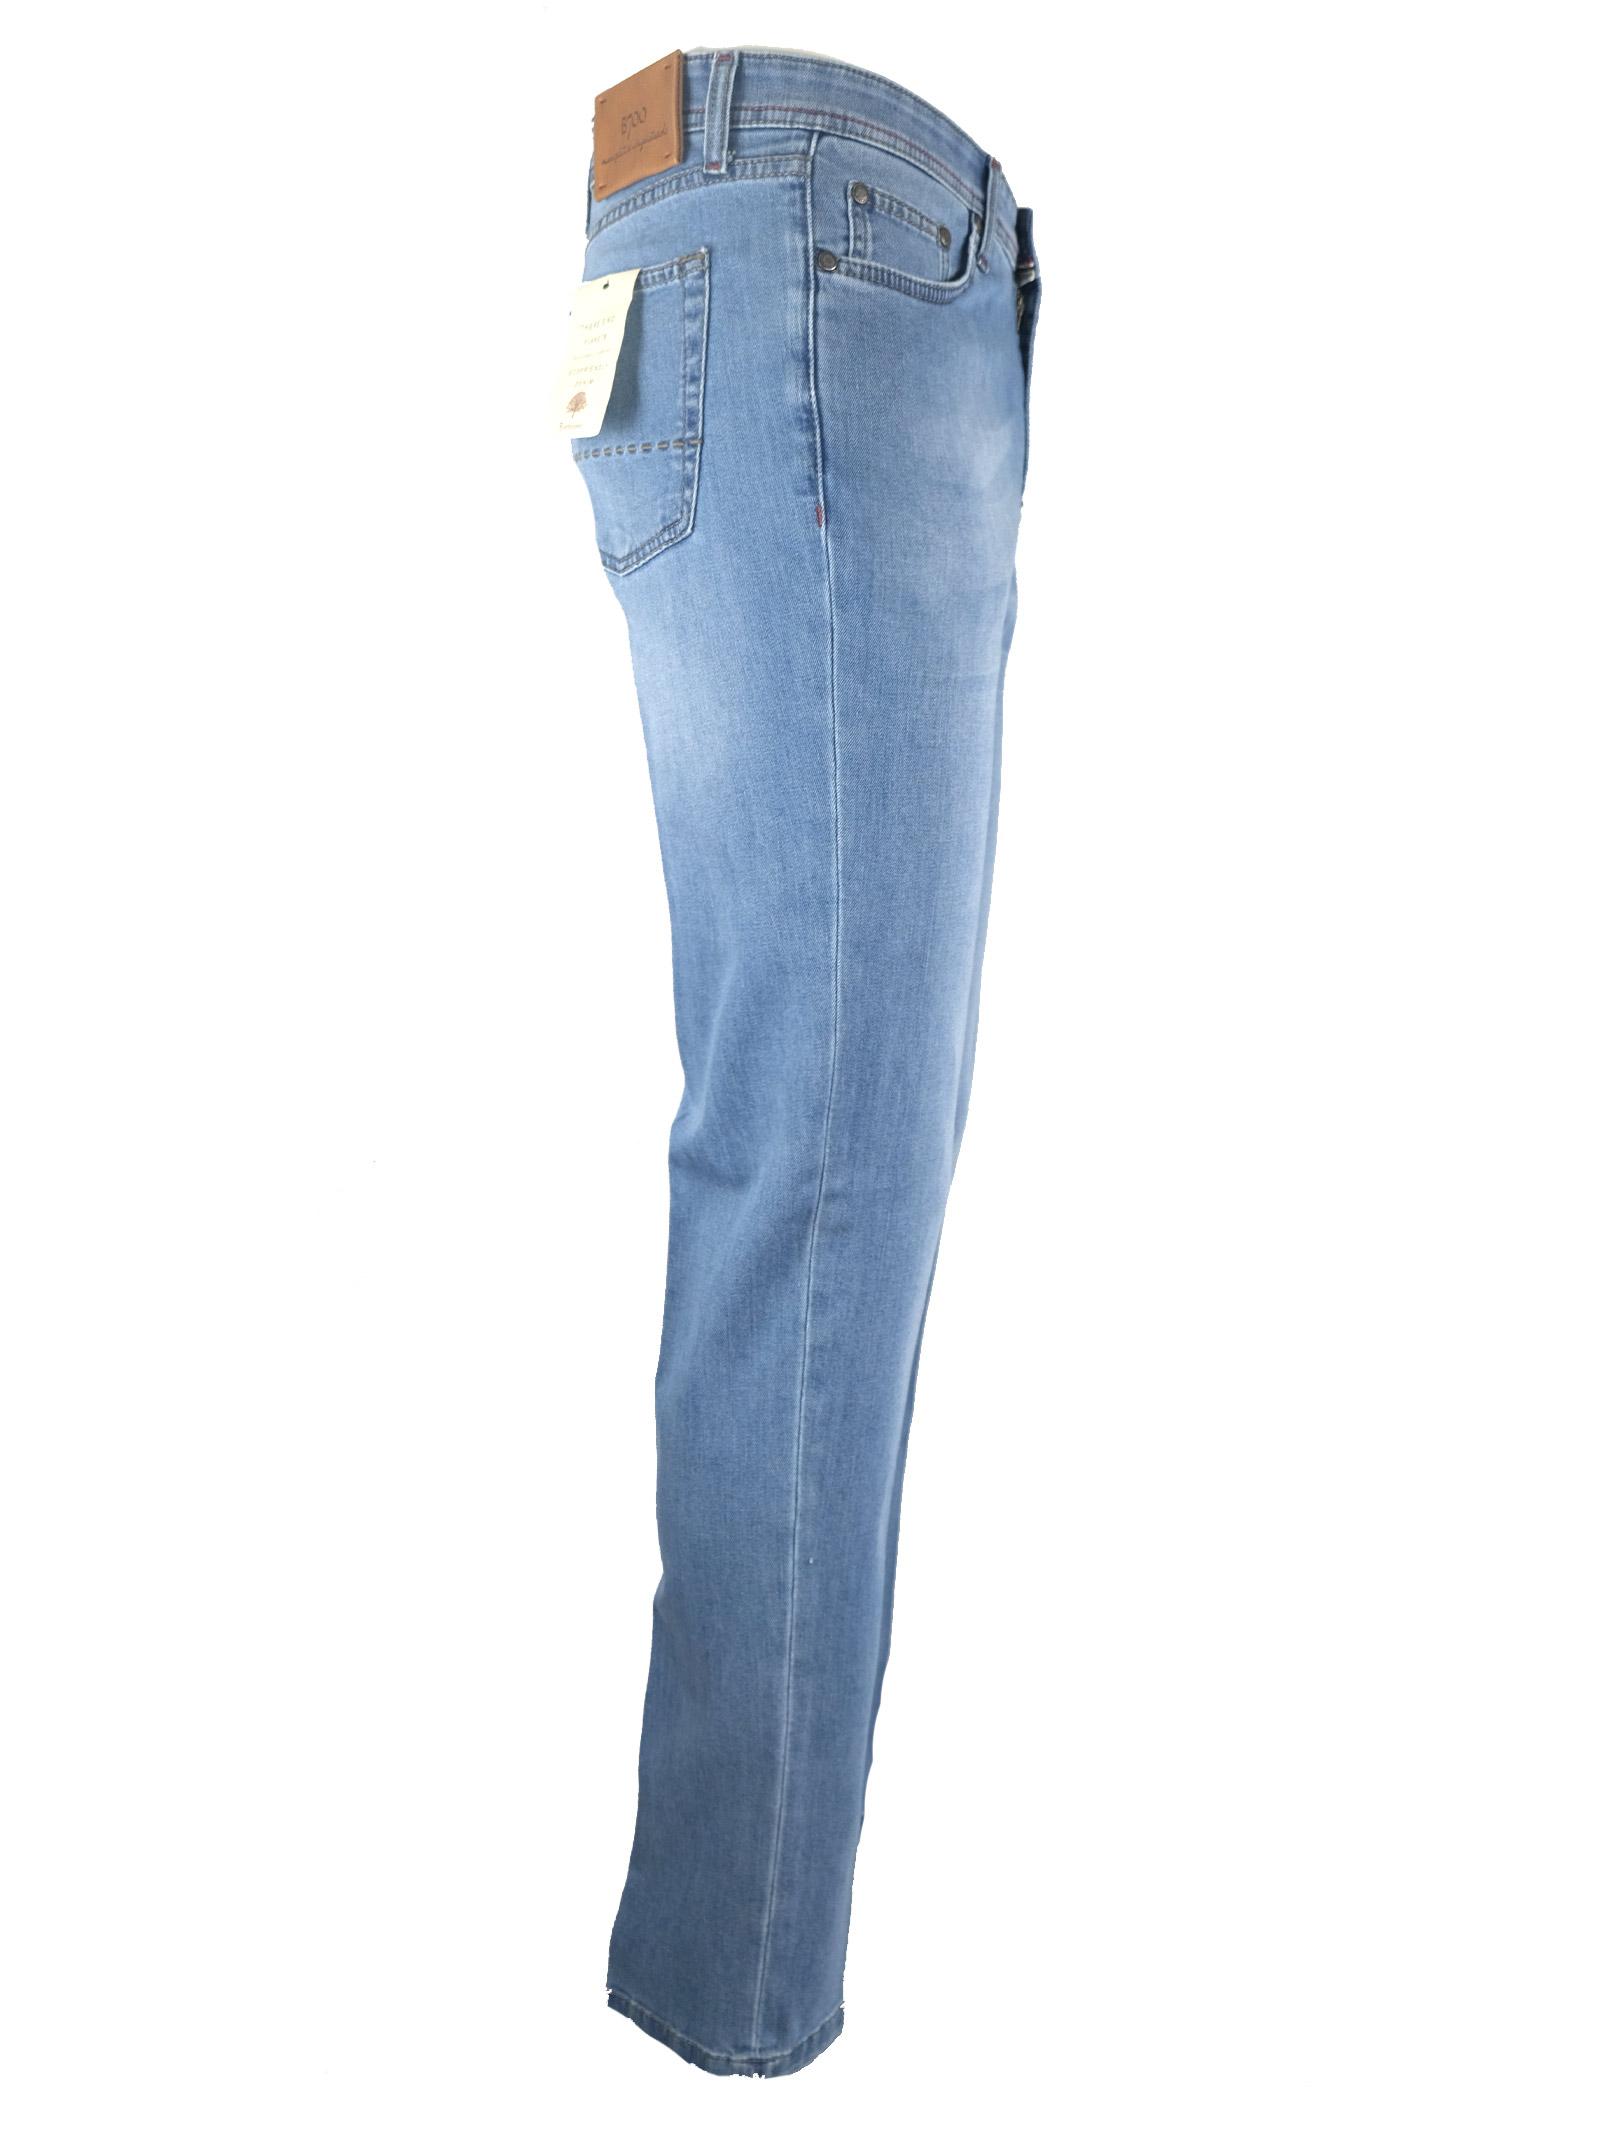 8  OZ. LIGHT DENIM JEANS B700 | Jeans | JR704 9026108